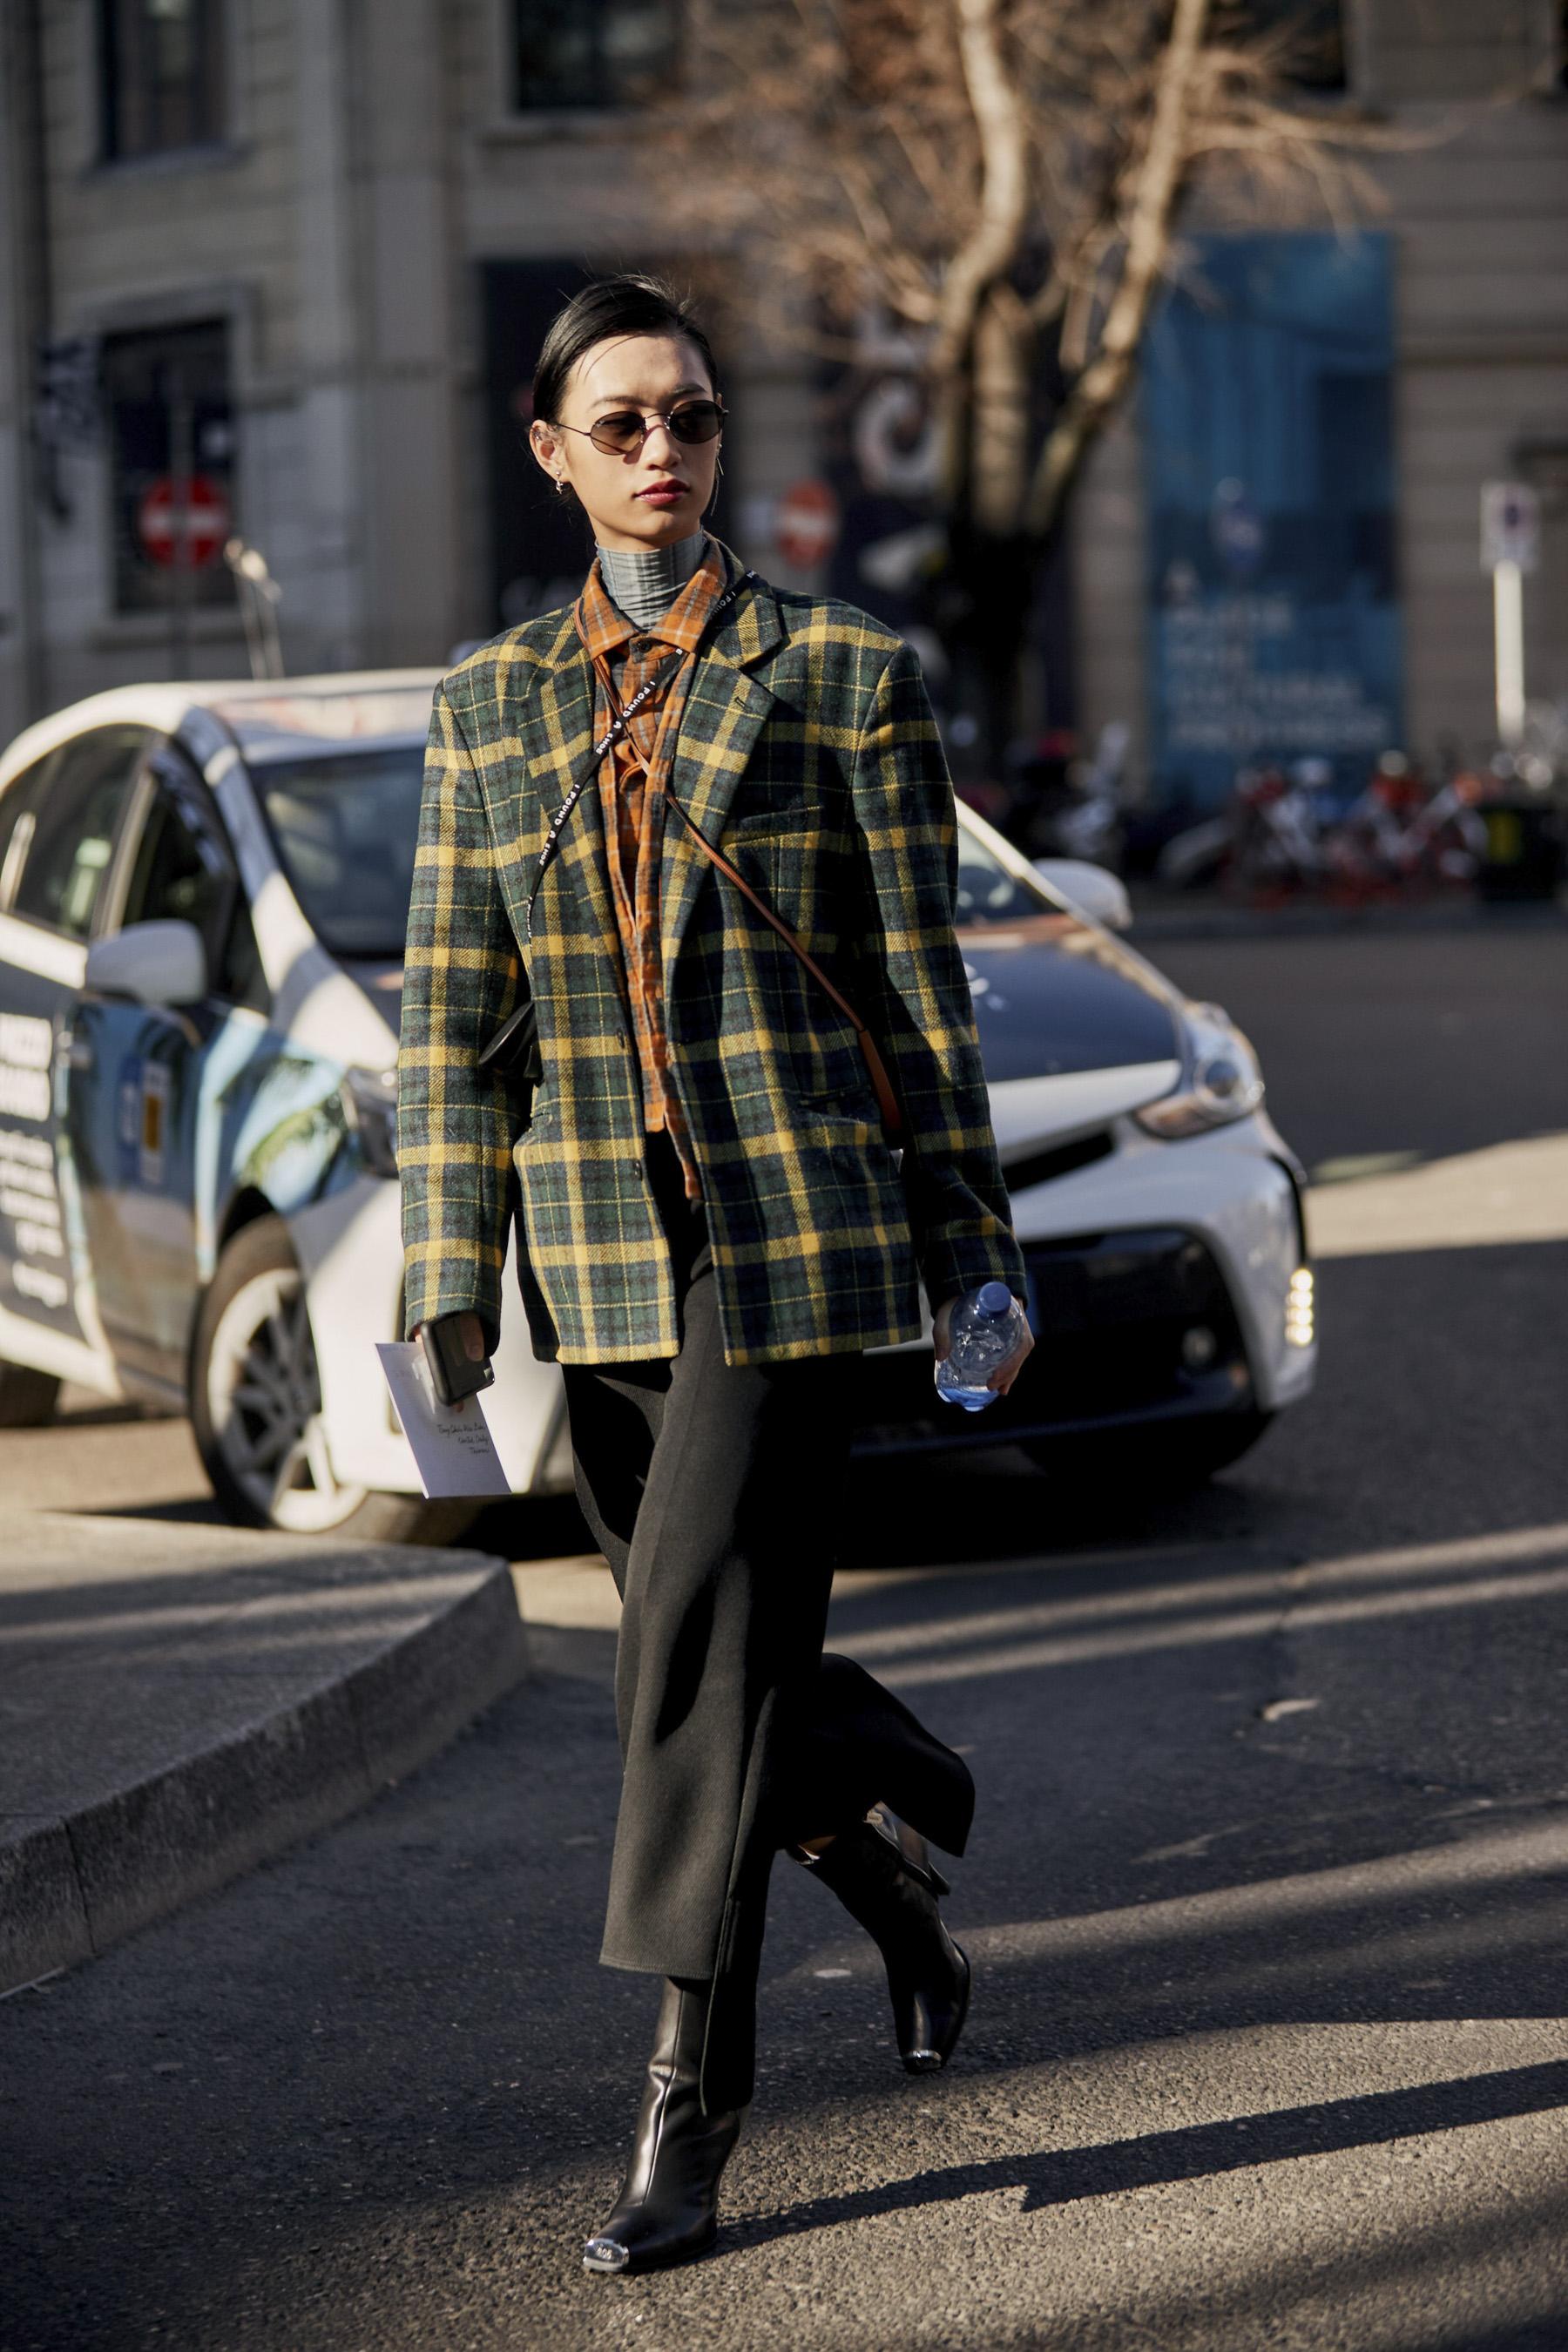 No Street Day 3 Bis Fall 2019 Men's Fashion Show